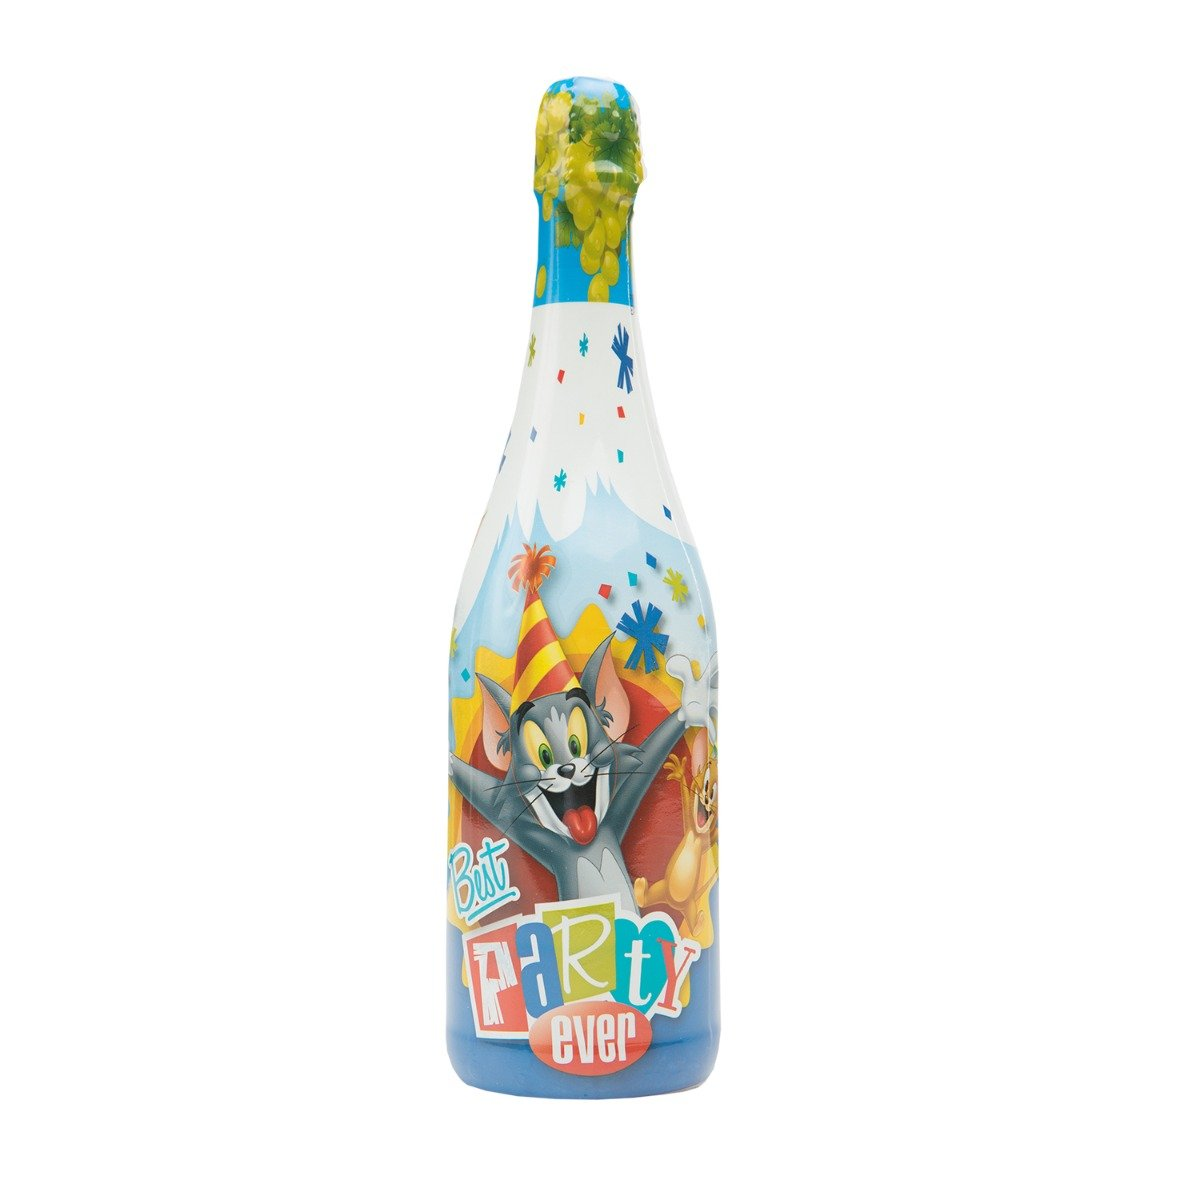 Sampanie pentru copii cu strugure Vitapress, Tom and Jerry, 0.75 L imagine